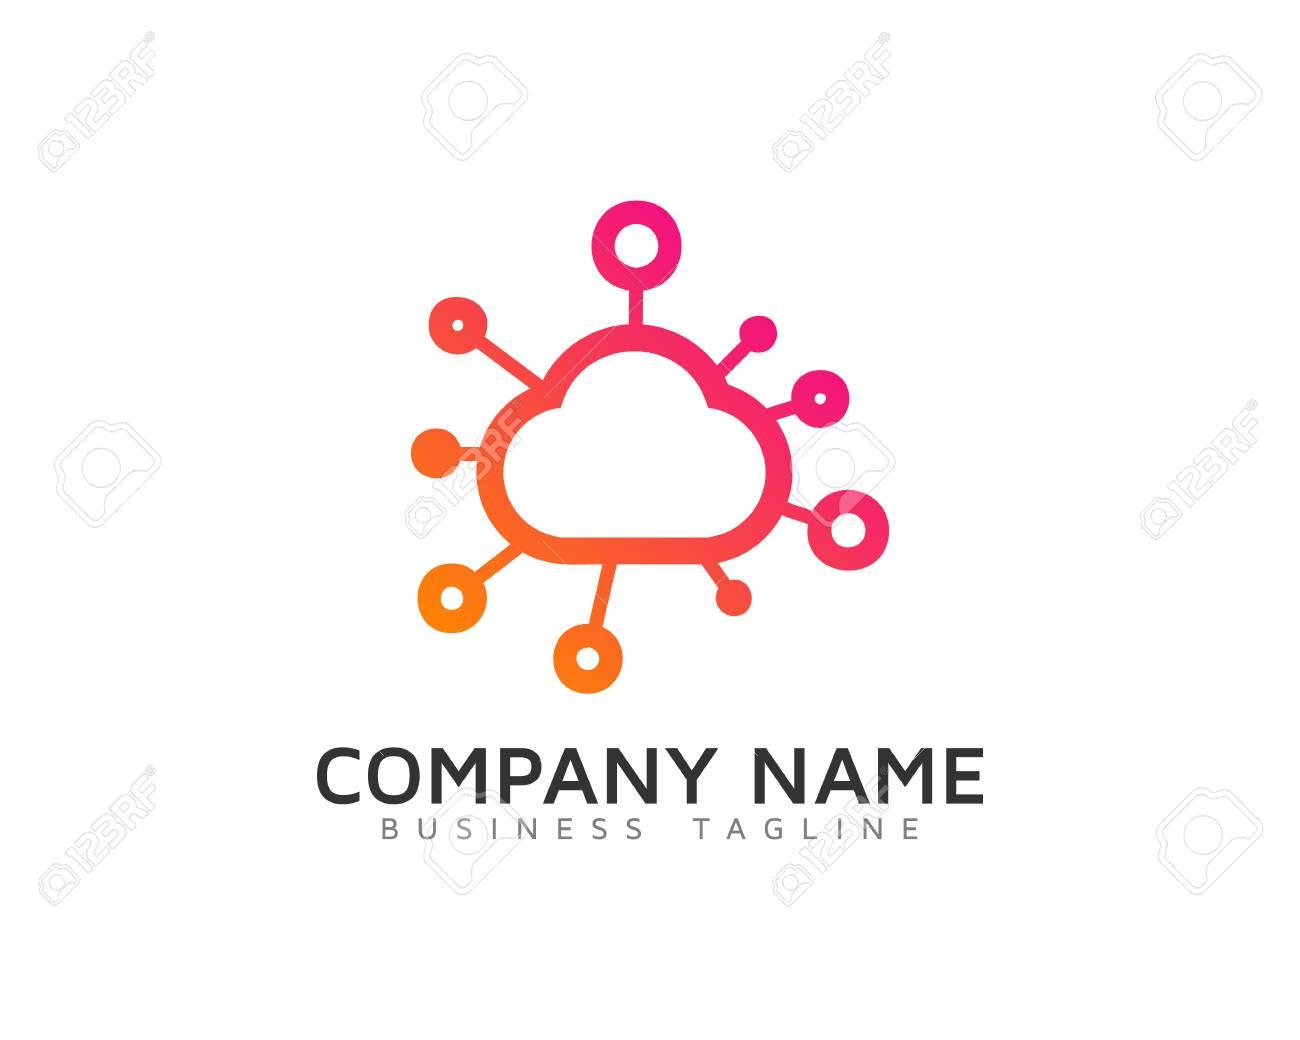 Cloud Share Design Template - 70577732